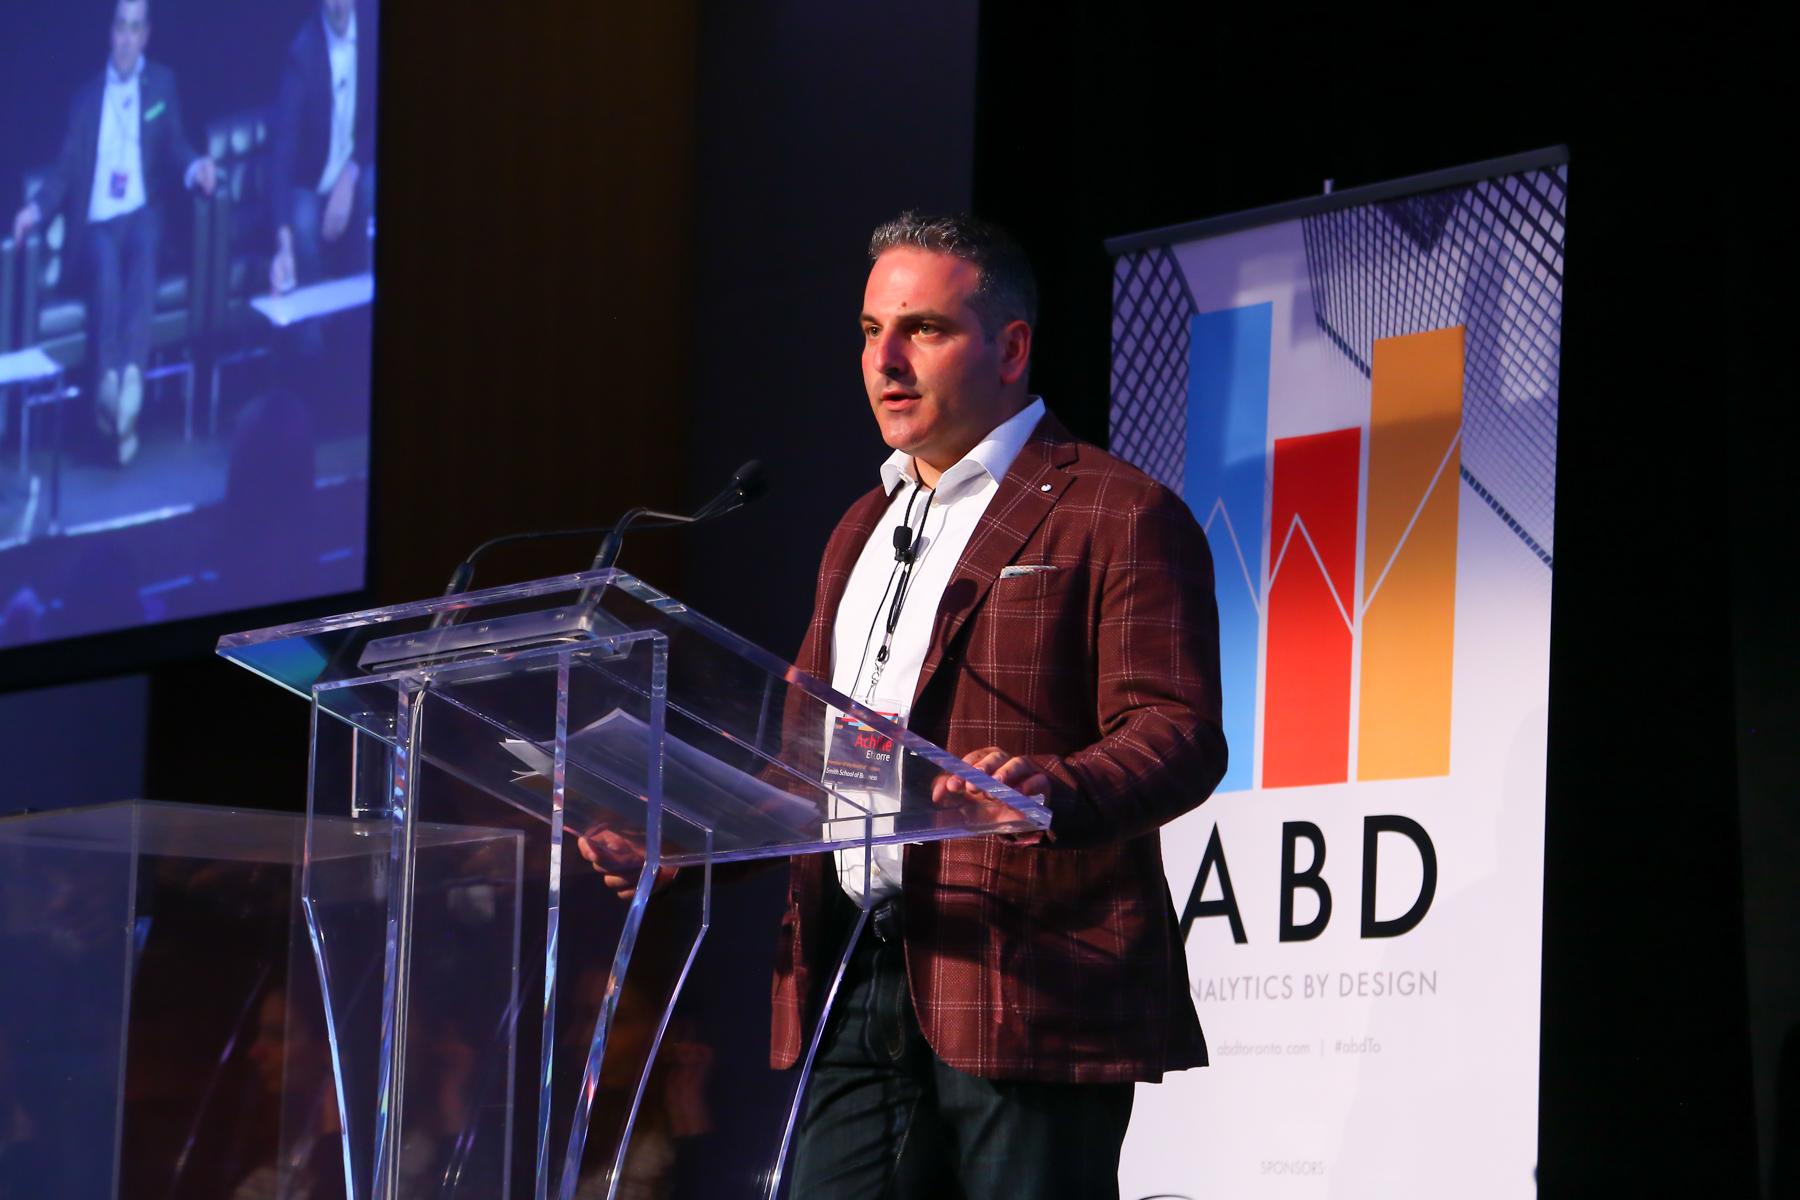 ABD_Conference_2018-091.jpg